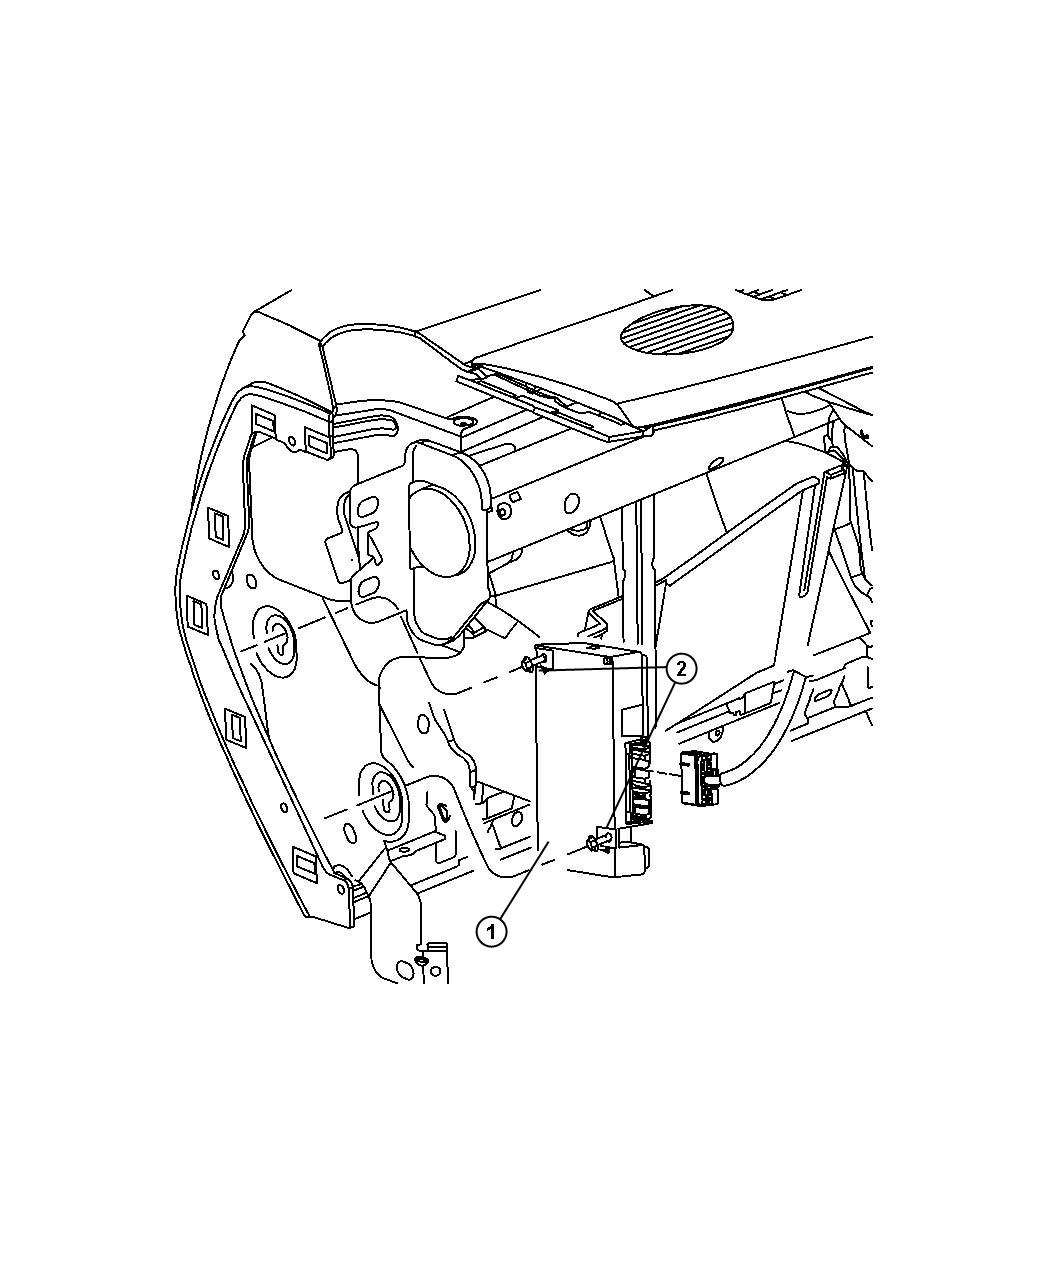 2010 Dodge Ram 1500 Module. Telematics. Uconnect, voice